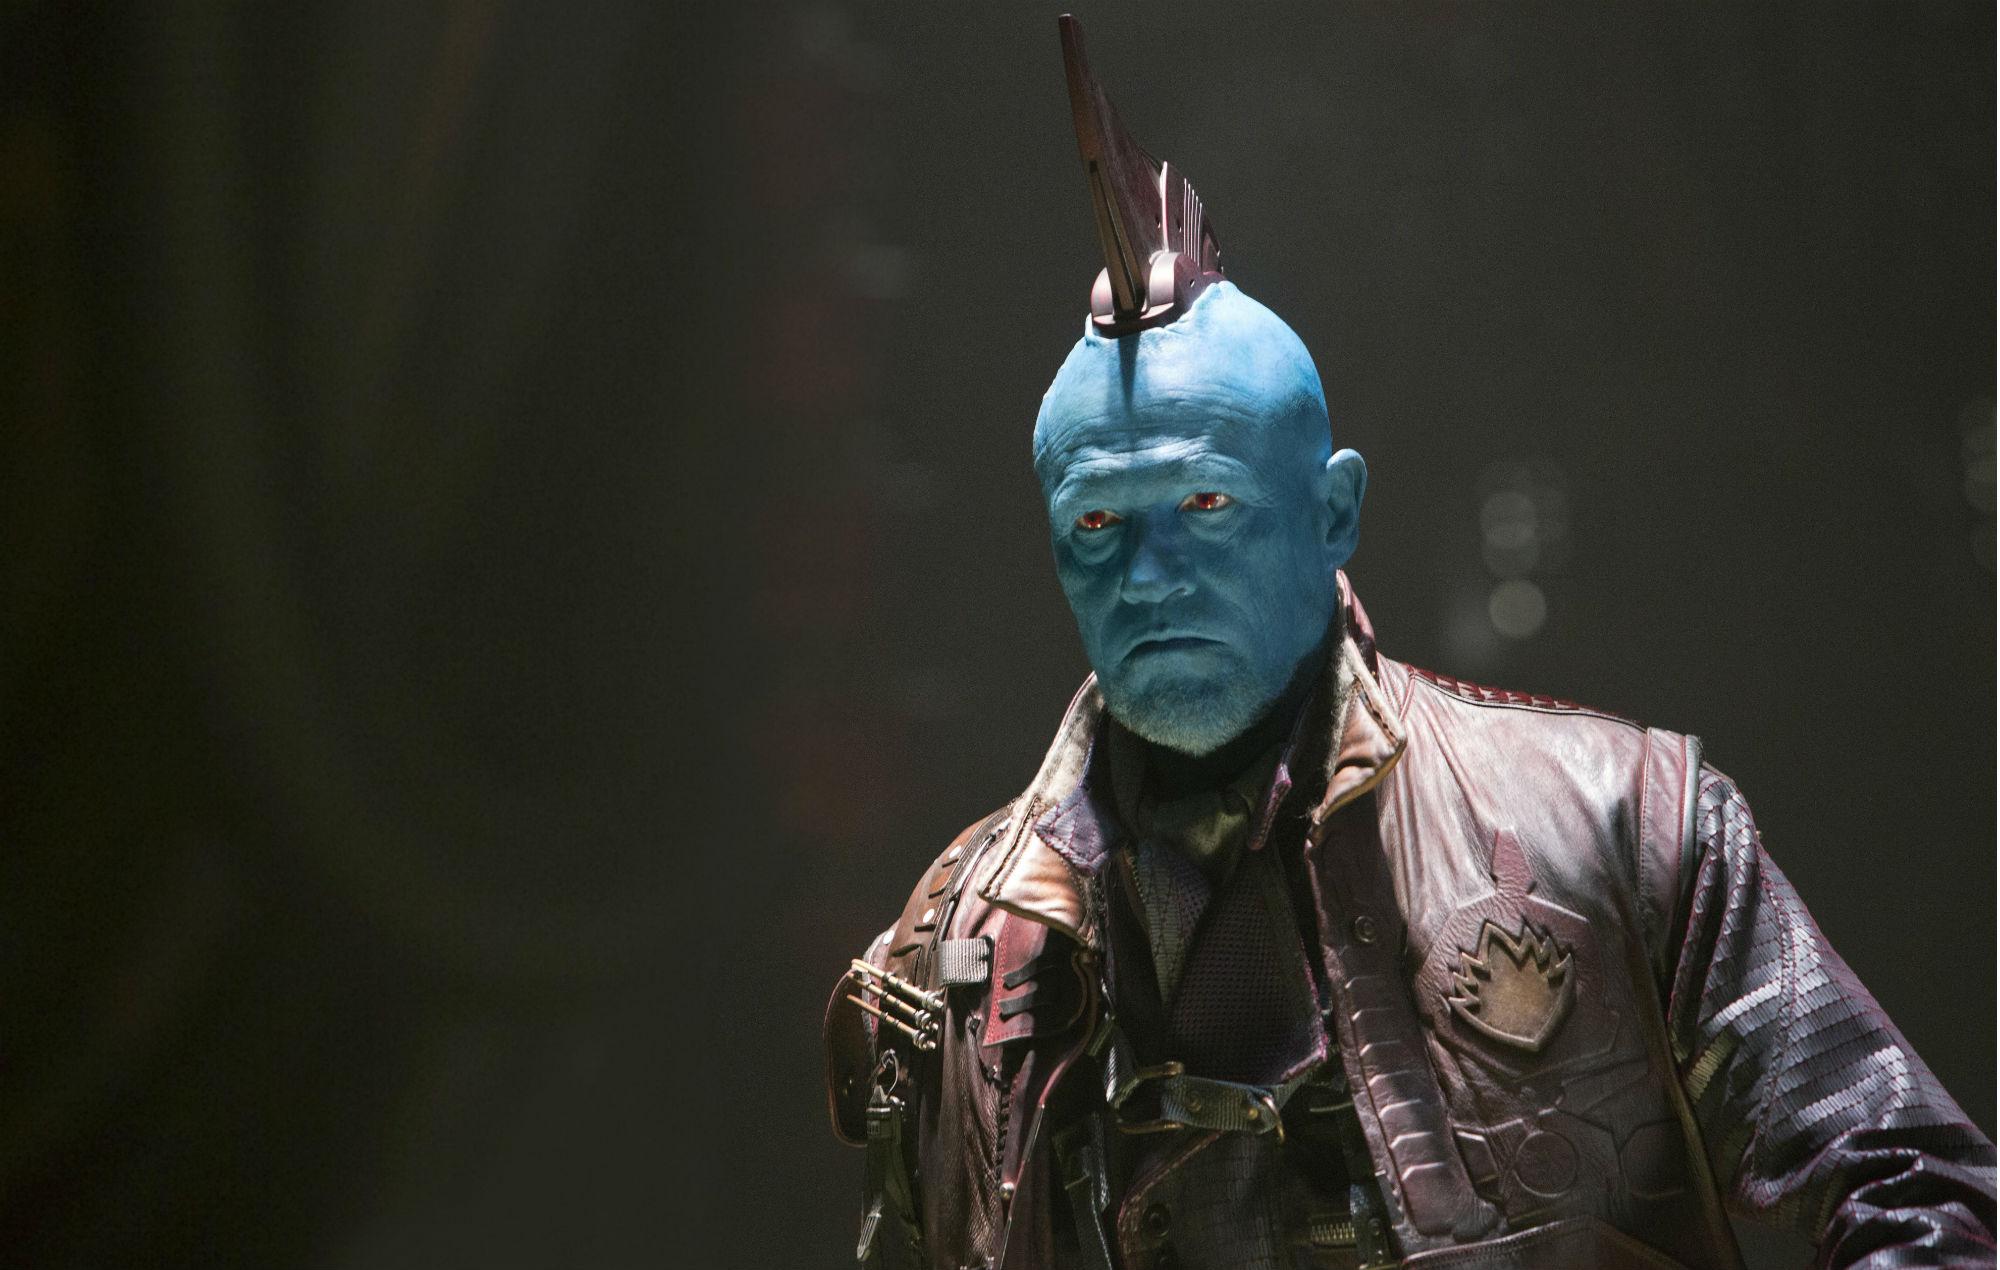 Les Gardiens de la Galaxie : Yondu ne reviendra pas selon Michael Rooker